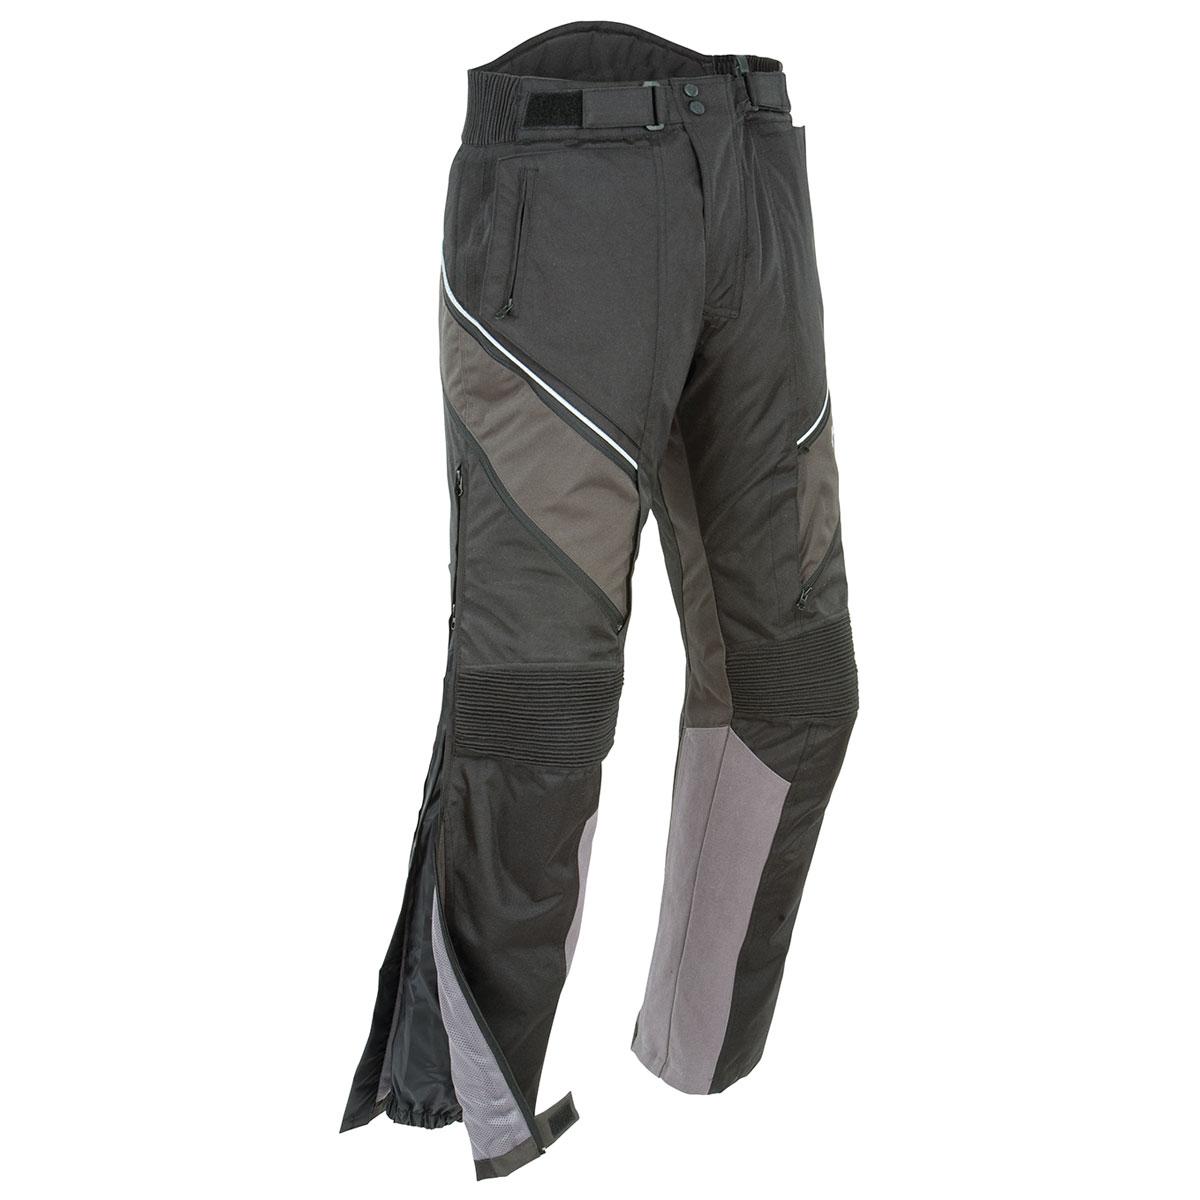 Joe Rocket Men's Alter Ego 2.0 Gray/Black Pants